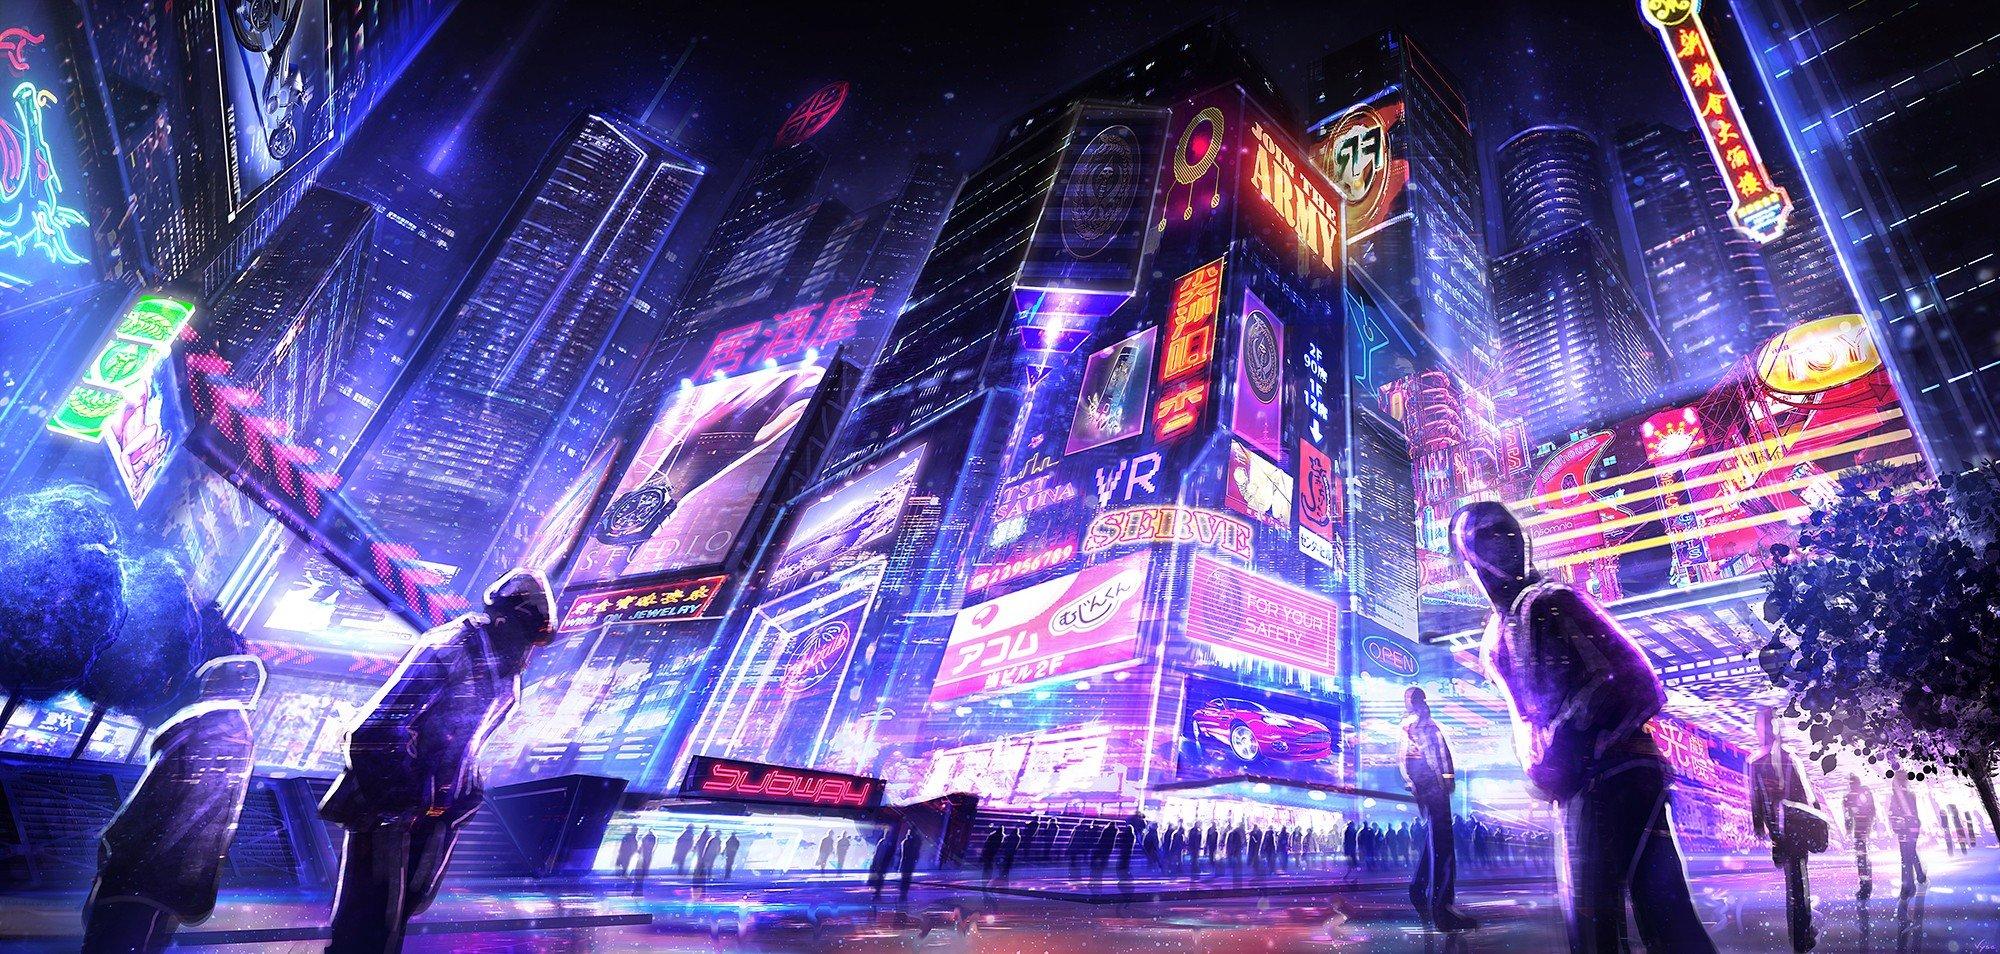 Cyberpunk 2077 City Wallpaper: Cyberpunk, Futuristic, Neon HD Wallpapers / Desktop And